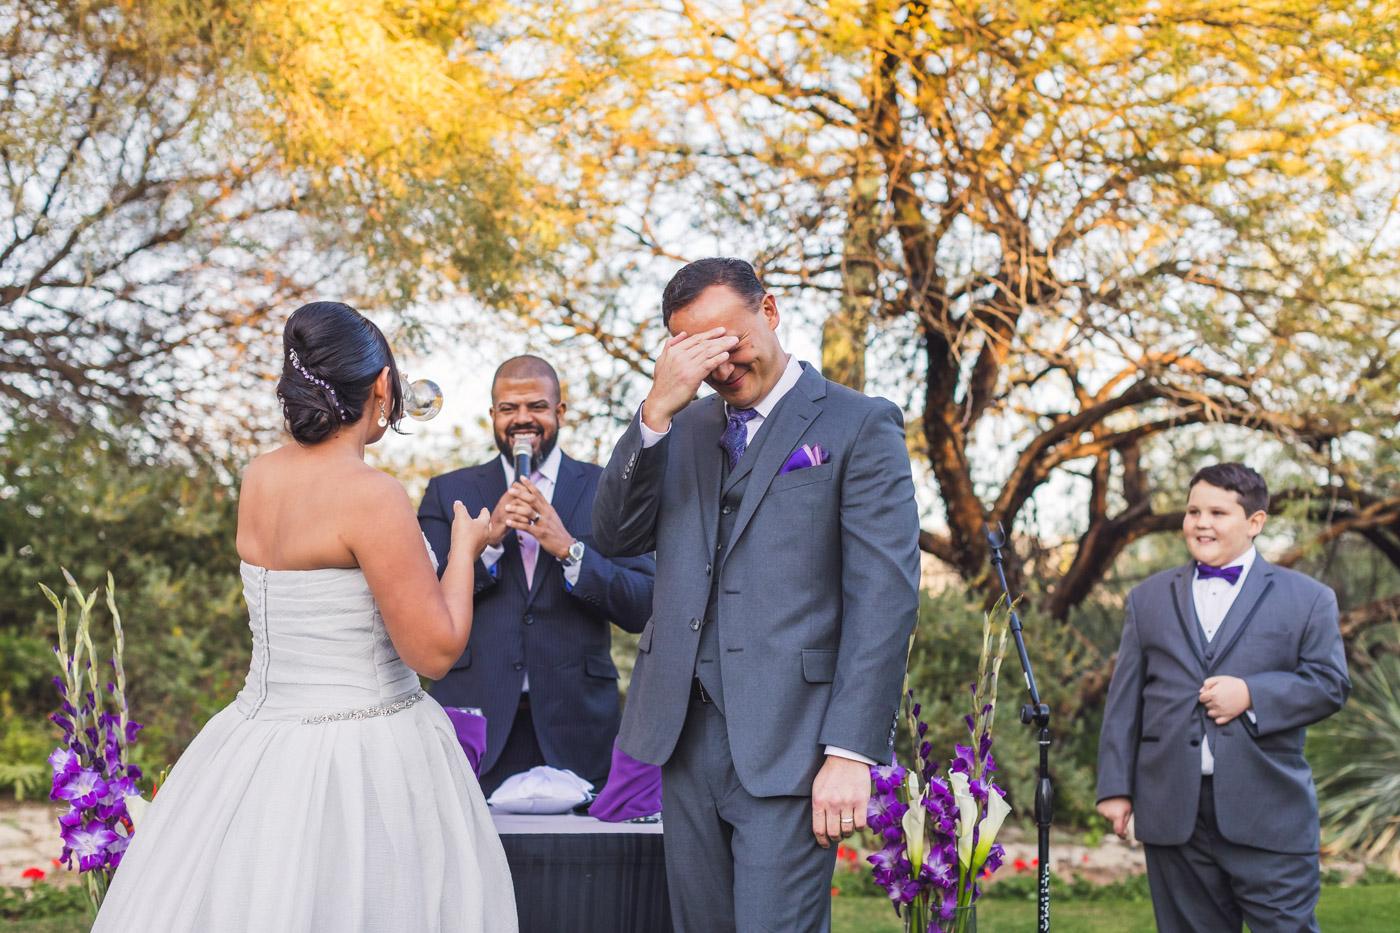 hilarious-wedding-ceremony-photo